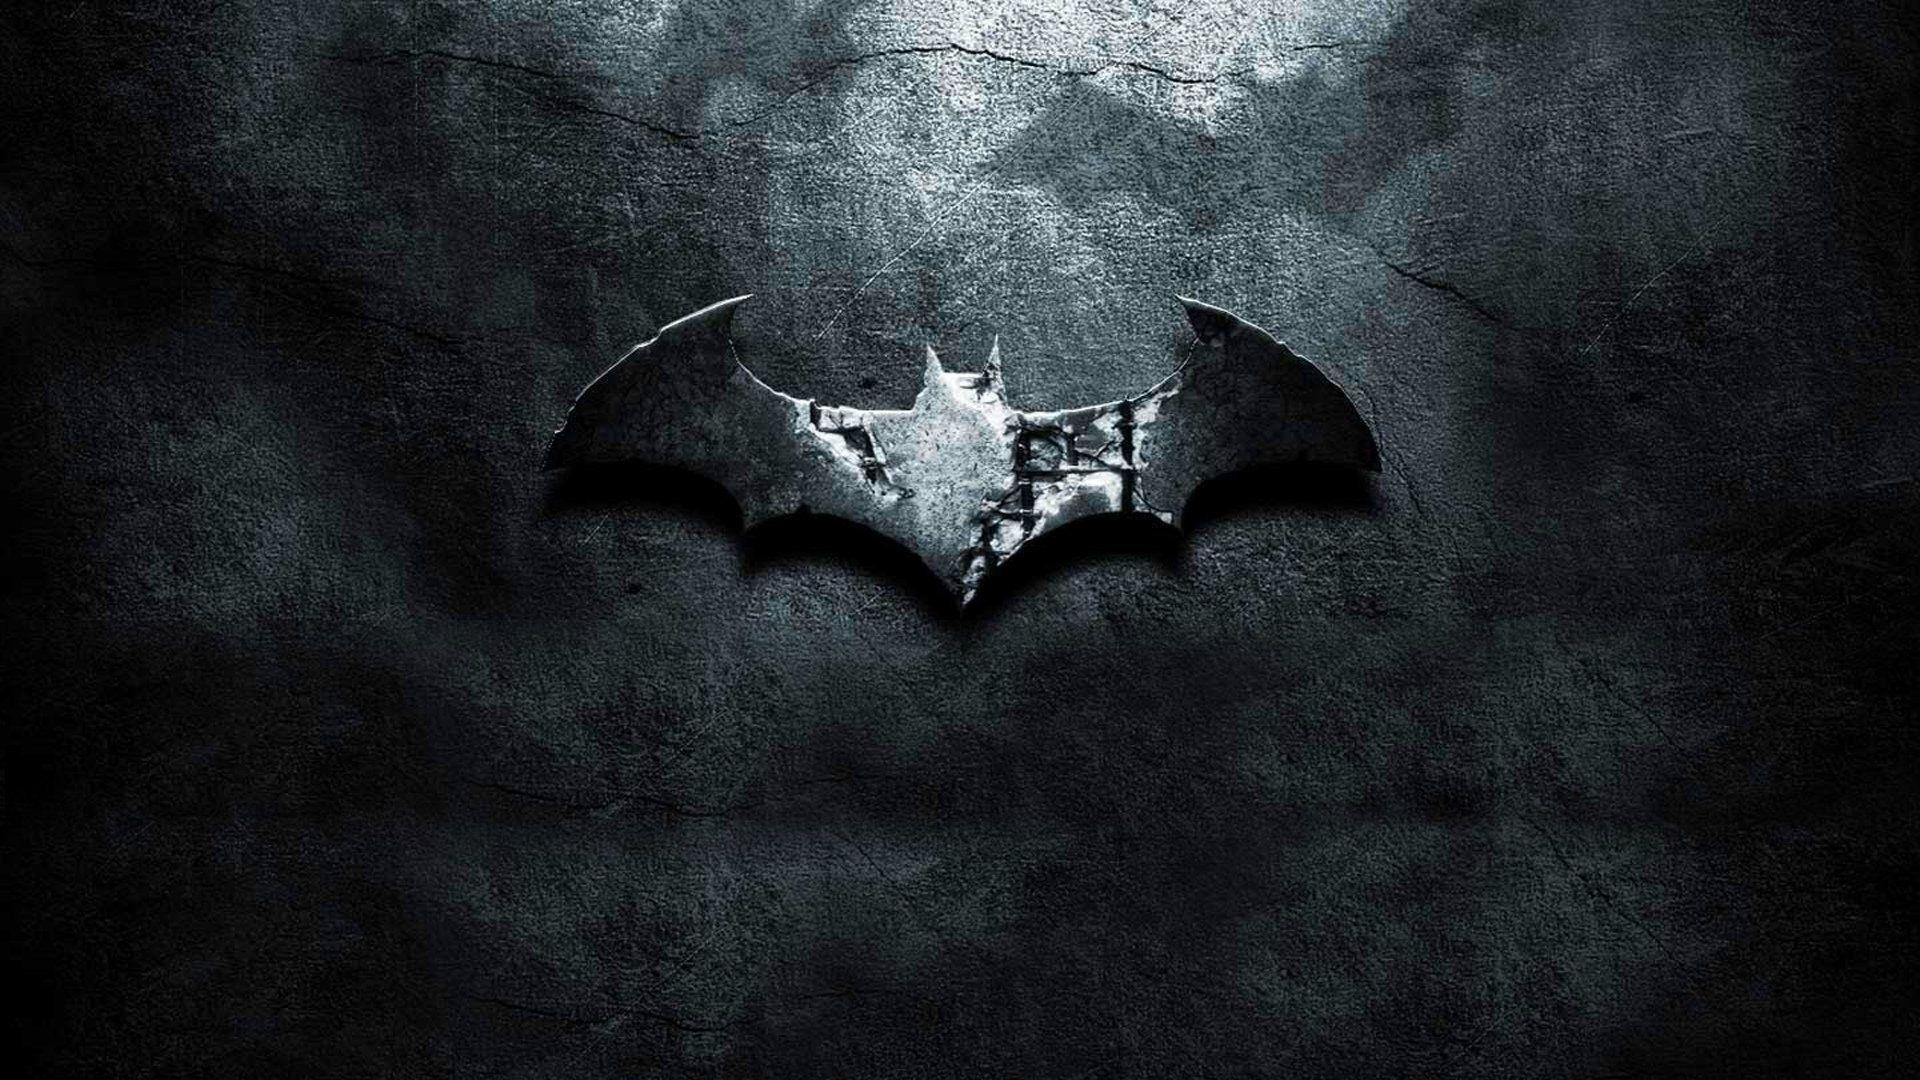 Wallpapers For > Hd Batman Wallpapers 1080p